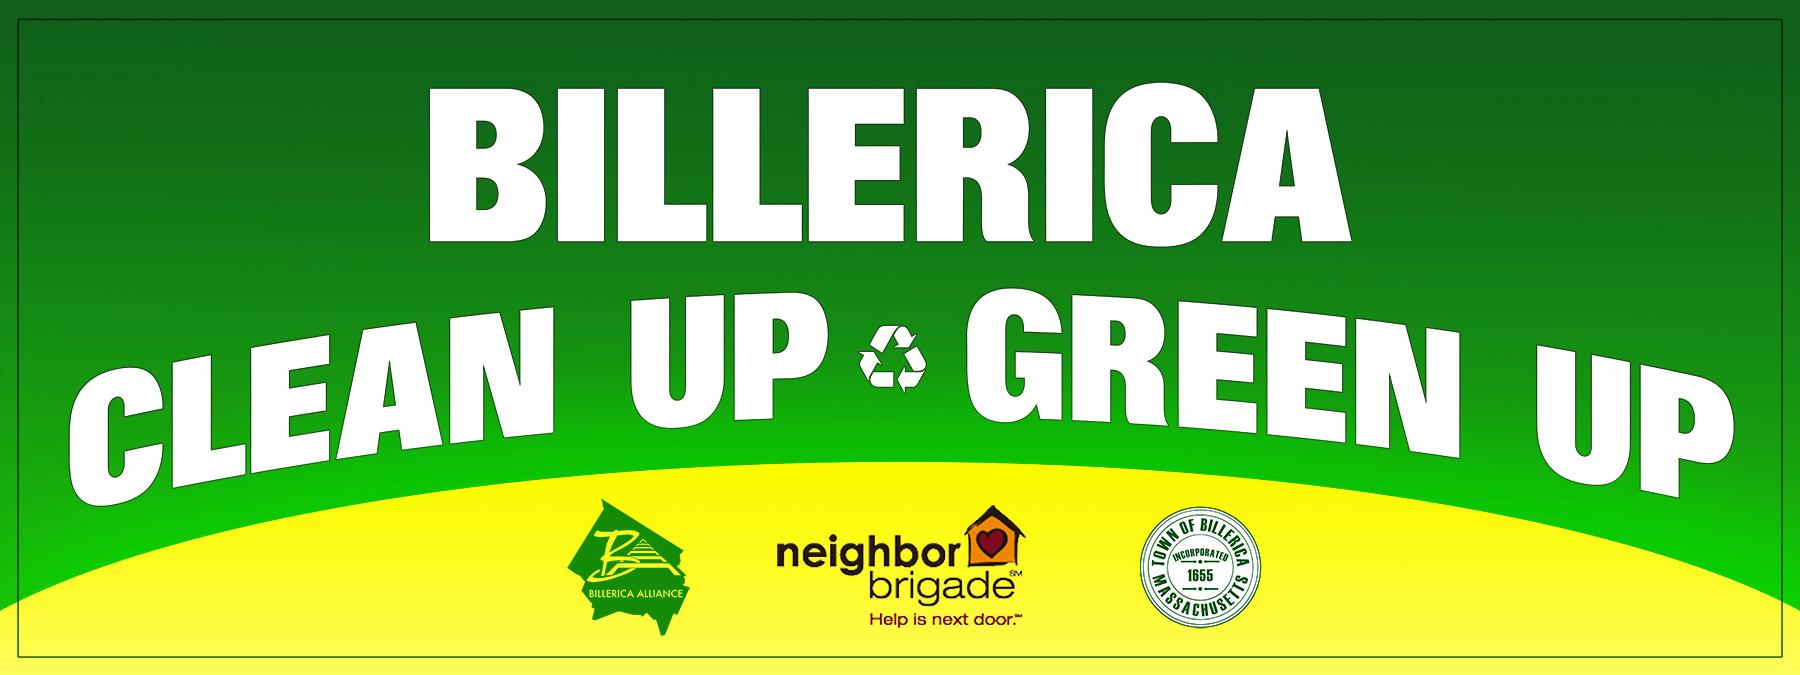 Billerica Clean Up Green Up